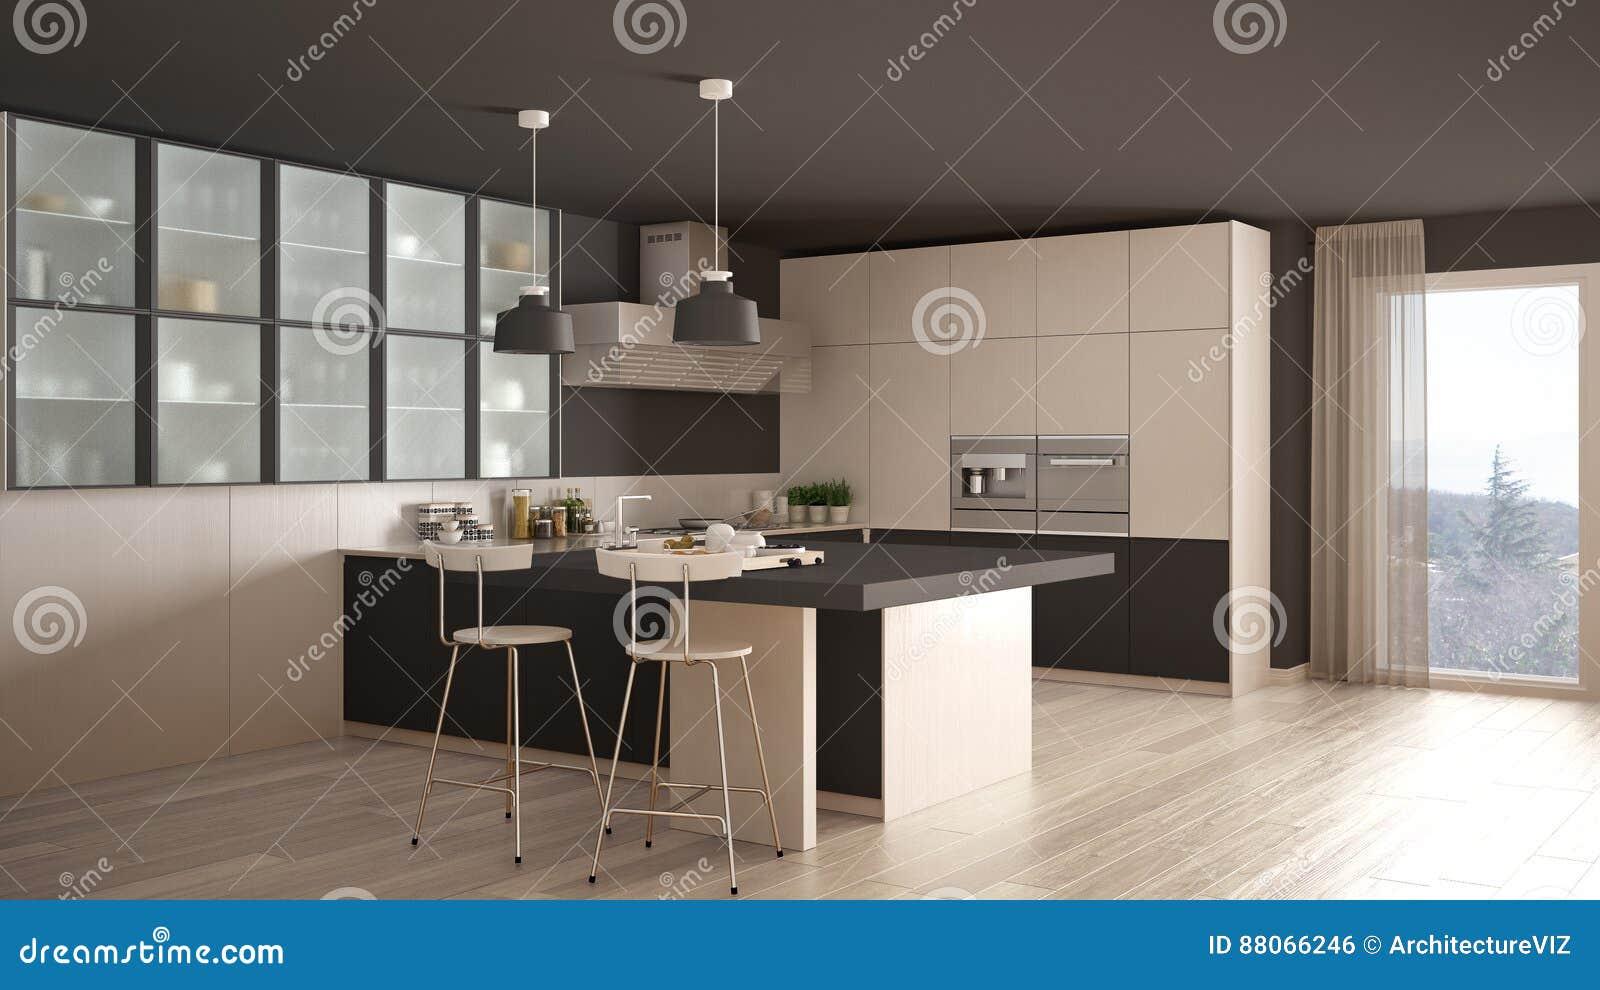 Grijze Keuken Modern : Klassieke minimale witte en grijze keuken met parketvloer moder